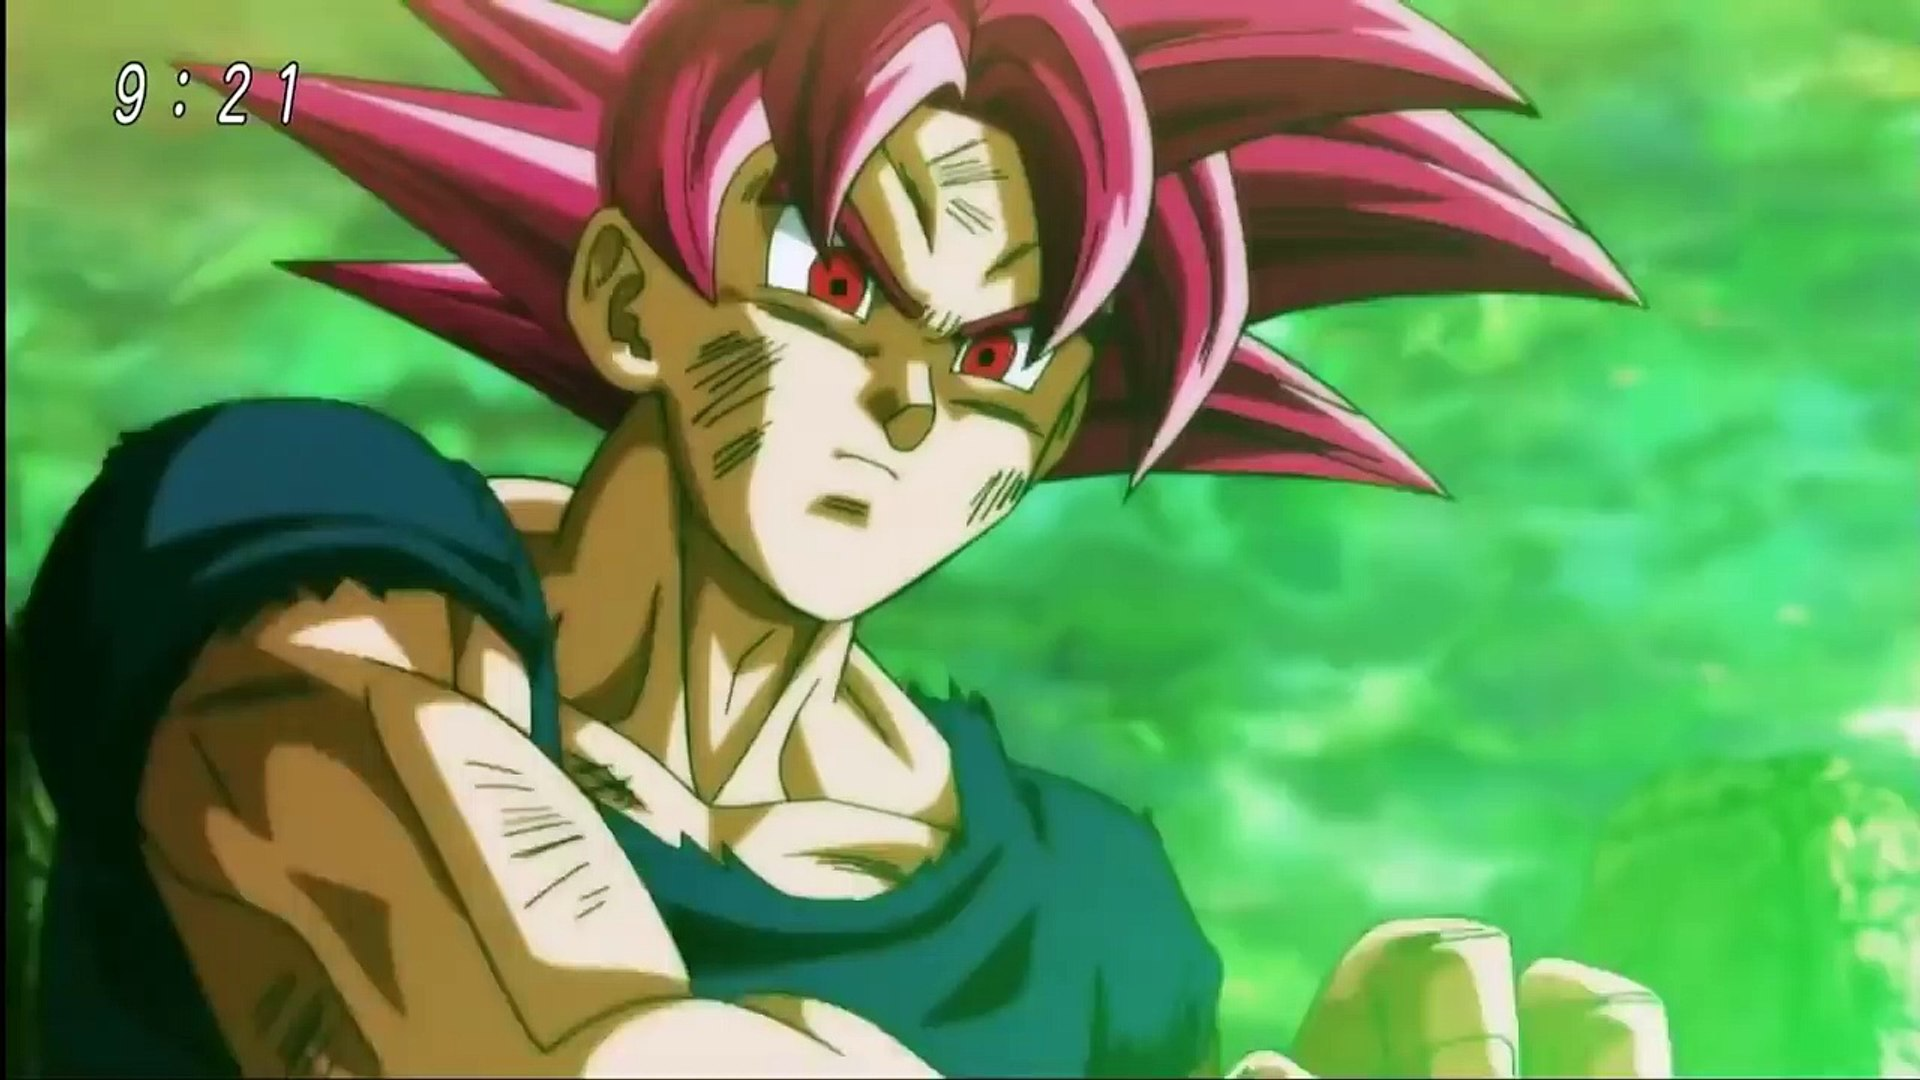 Kefla Vs Goku Ssj God Caulifla And Kale Fusion Dragon Ball Super Episode 114 Hd Dailymotion Video